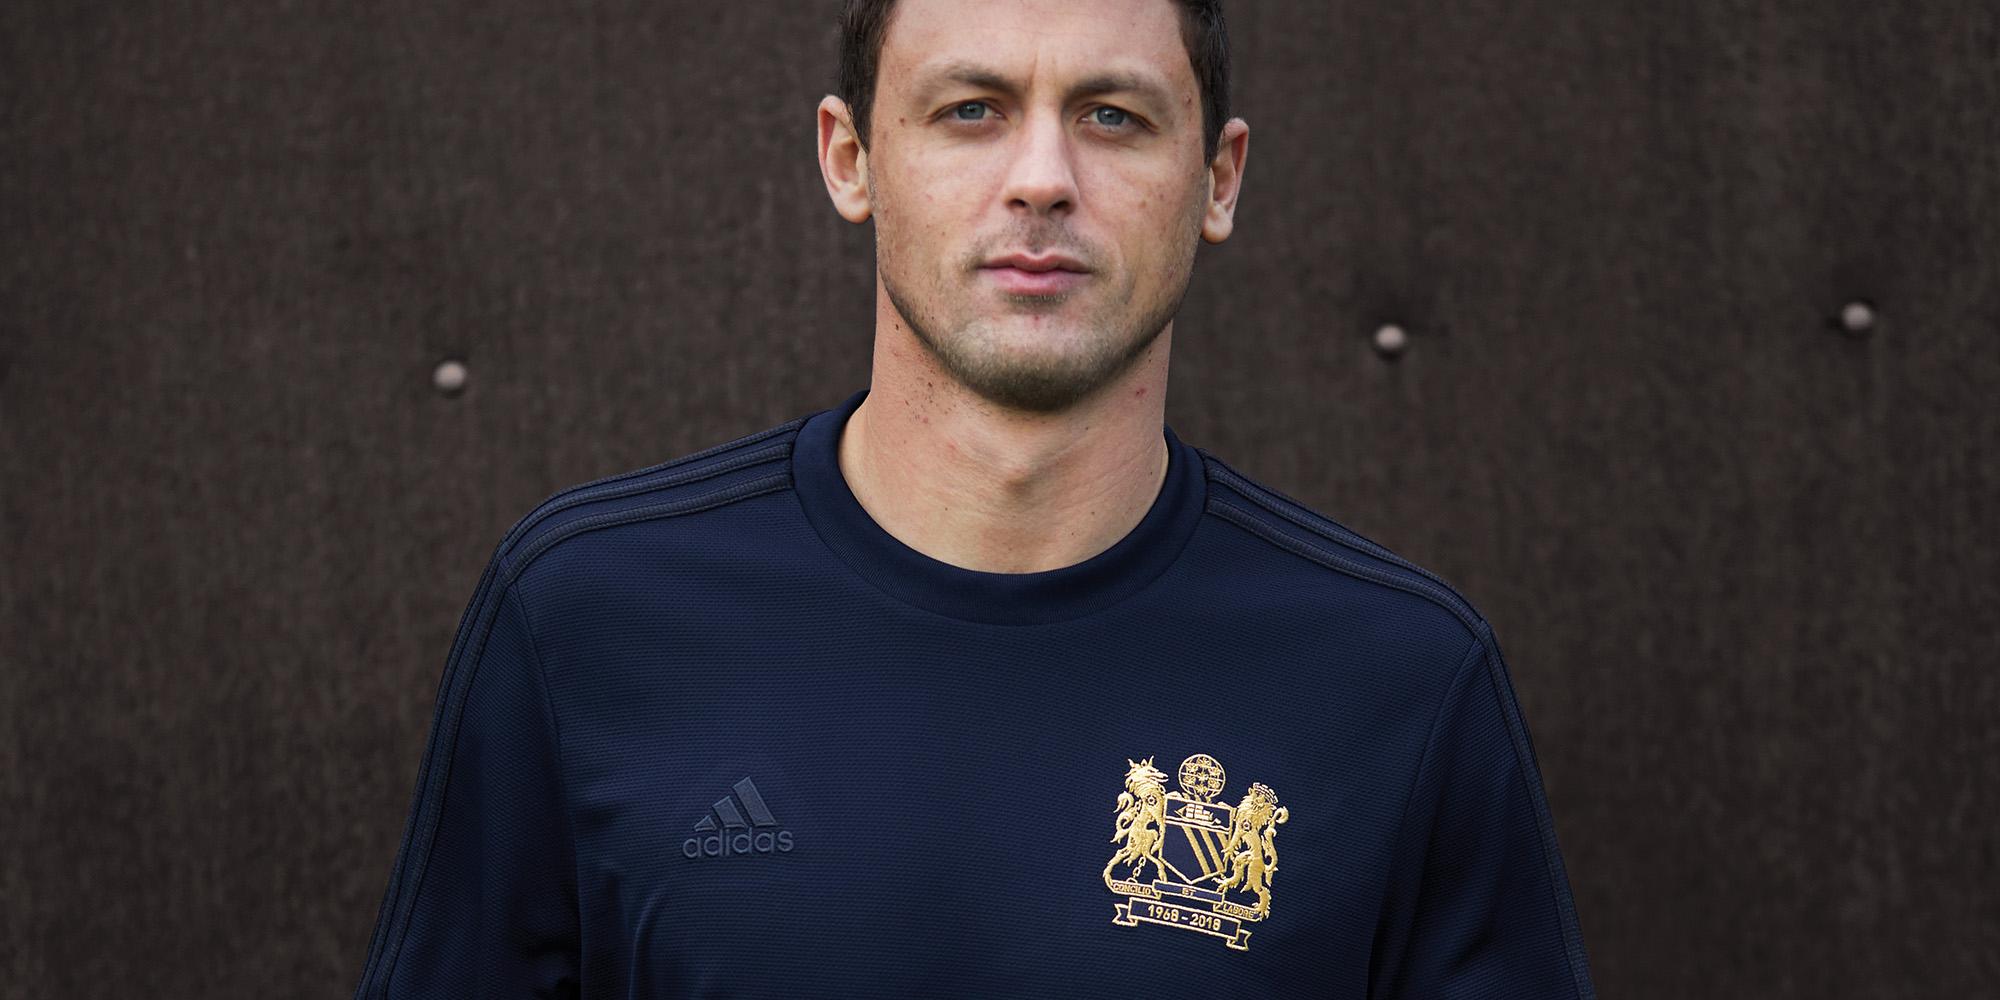 5753aa72dc1 Manchester United midfielder Nemanja Matic in a commemorative United top